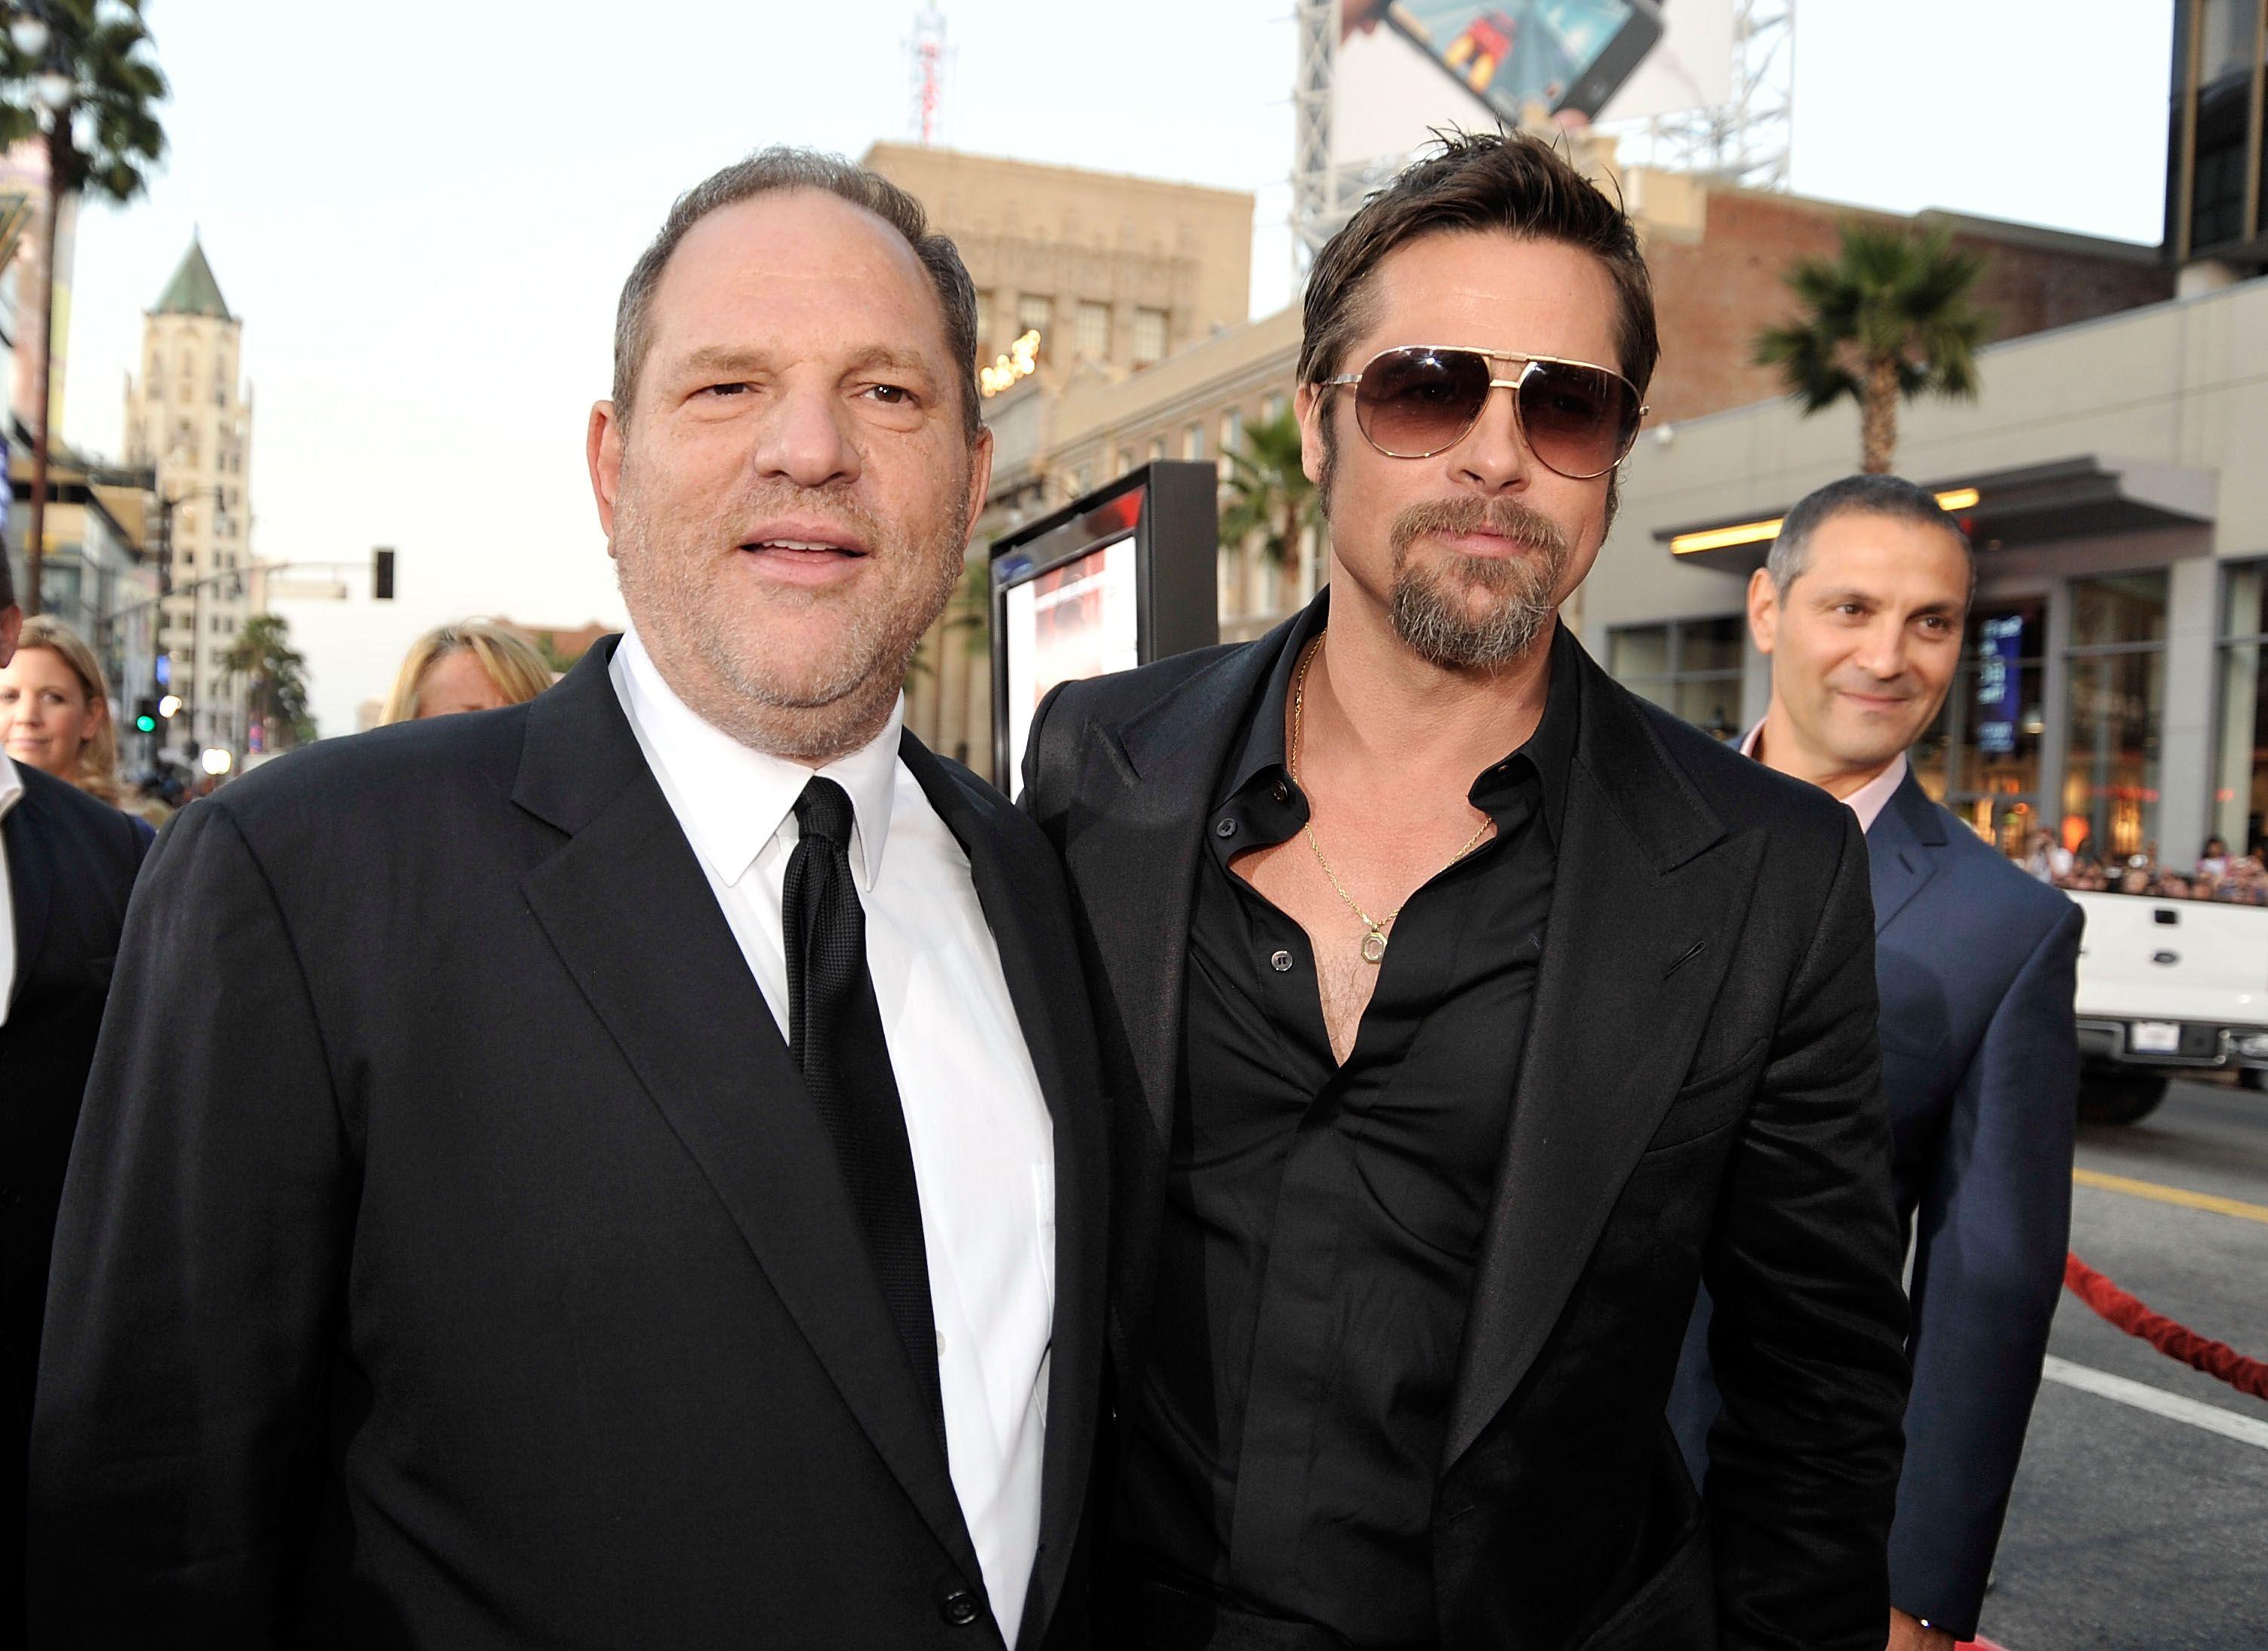 Brad Pitt To Produce Film On The Harvey Weinstein Investigation